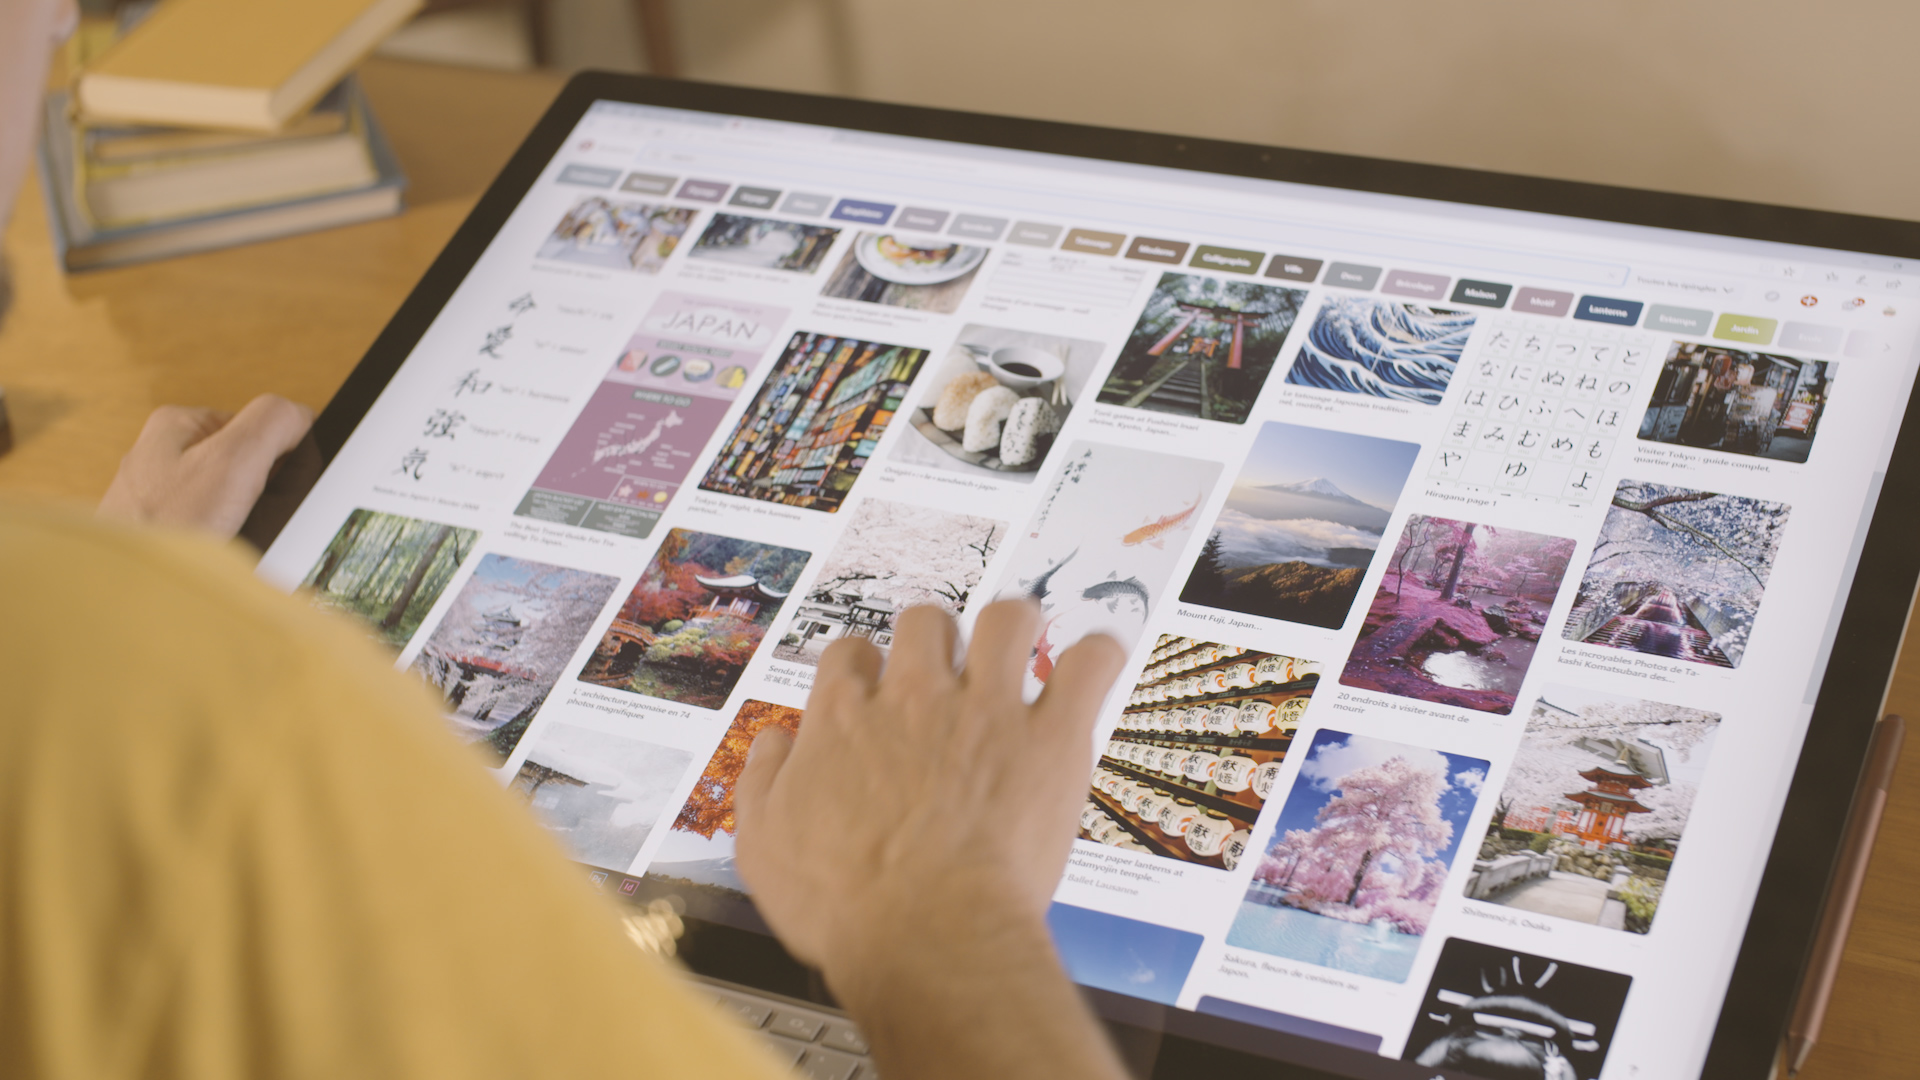 Beautiful Illustration Created with Microsoft's Surface Studio – Fubiz Media Design